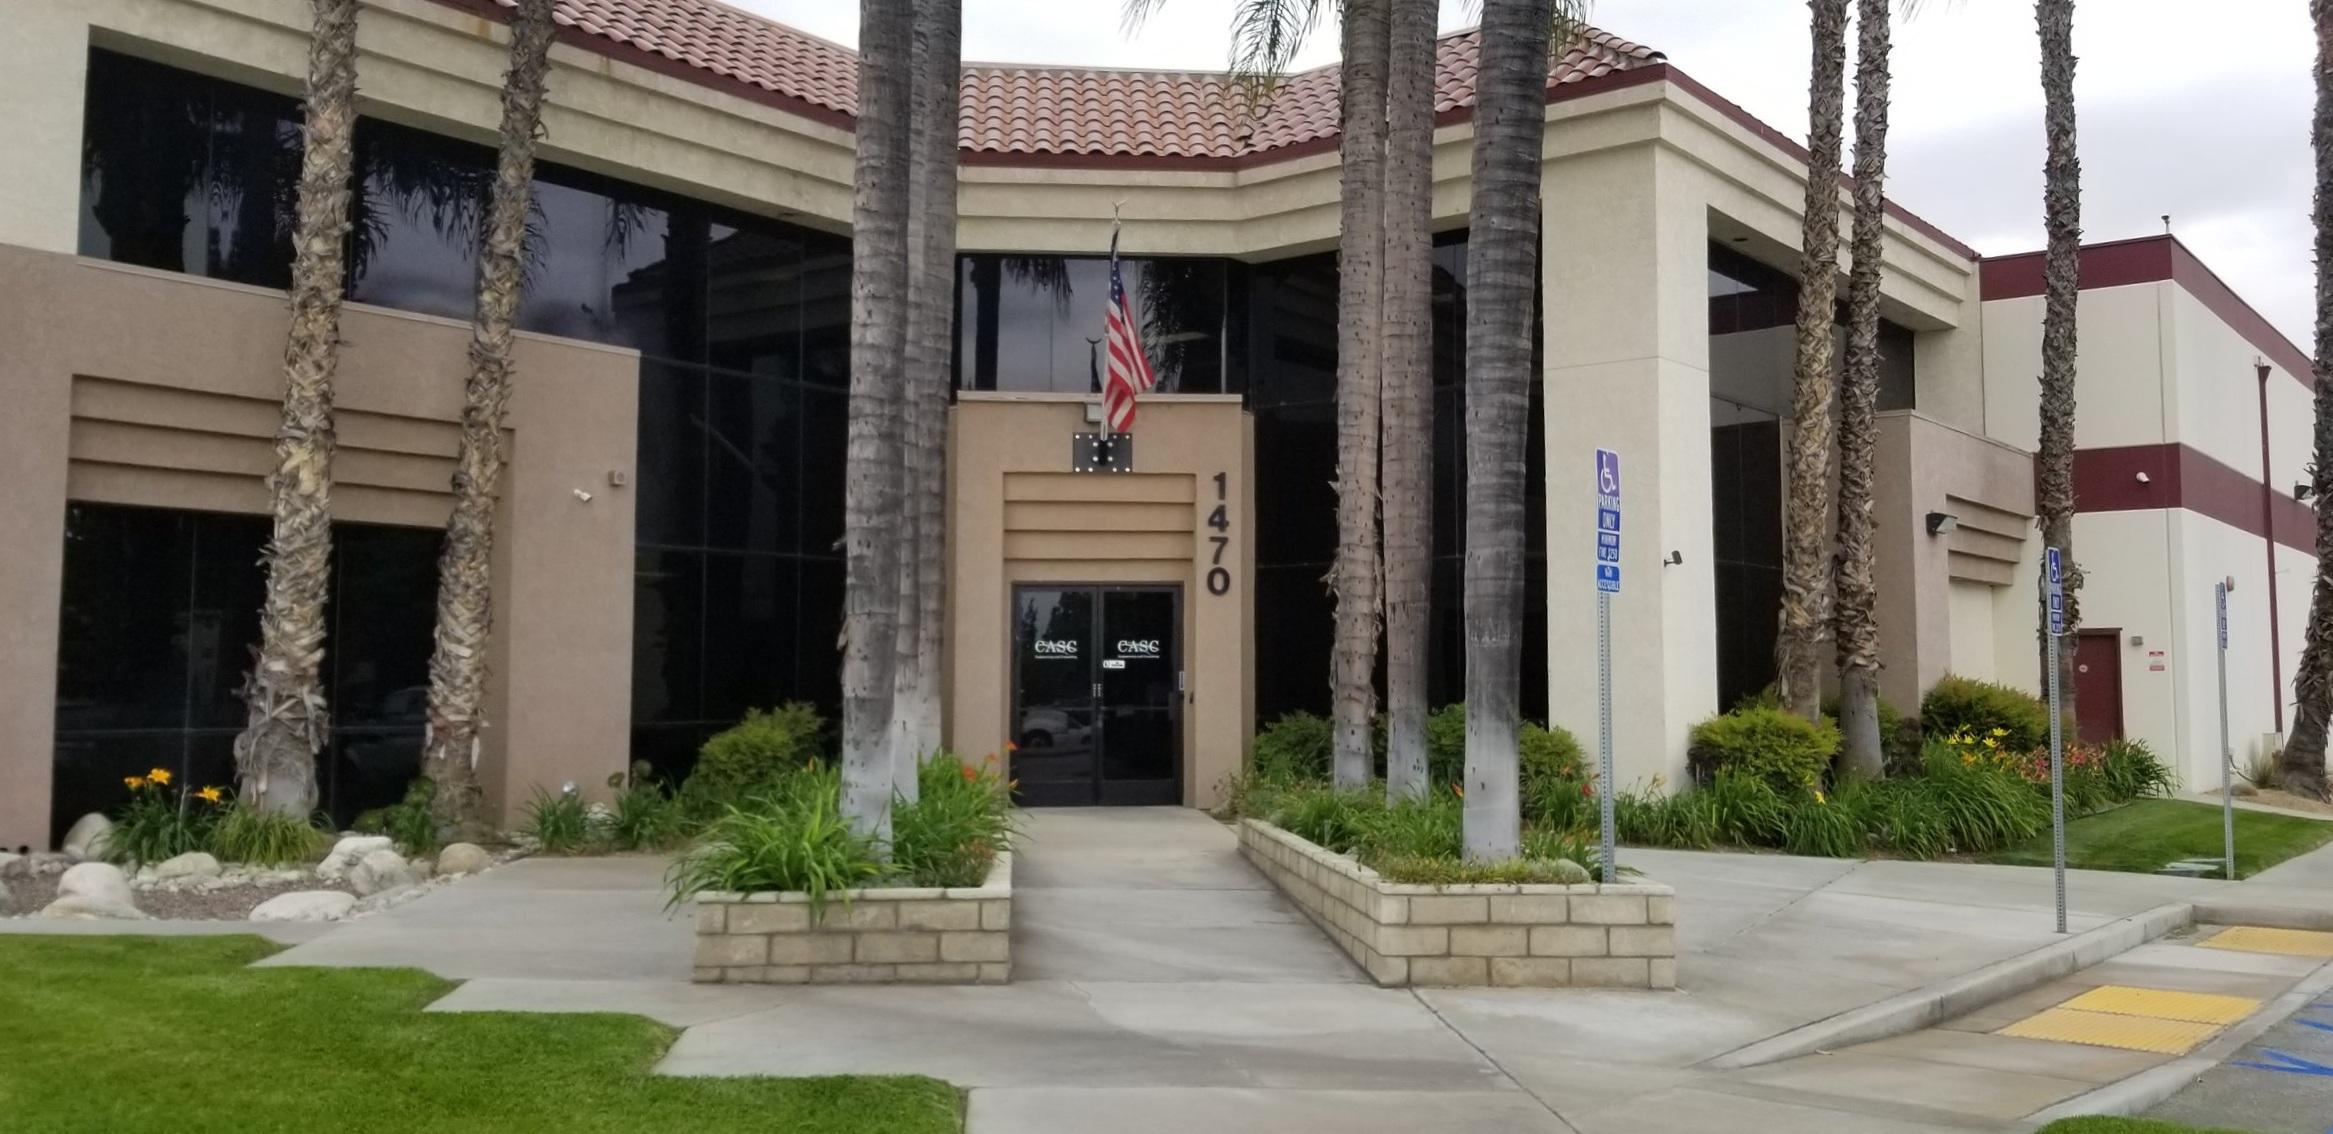 Picture of Corporate Office in Colton California.